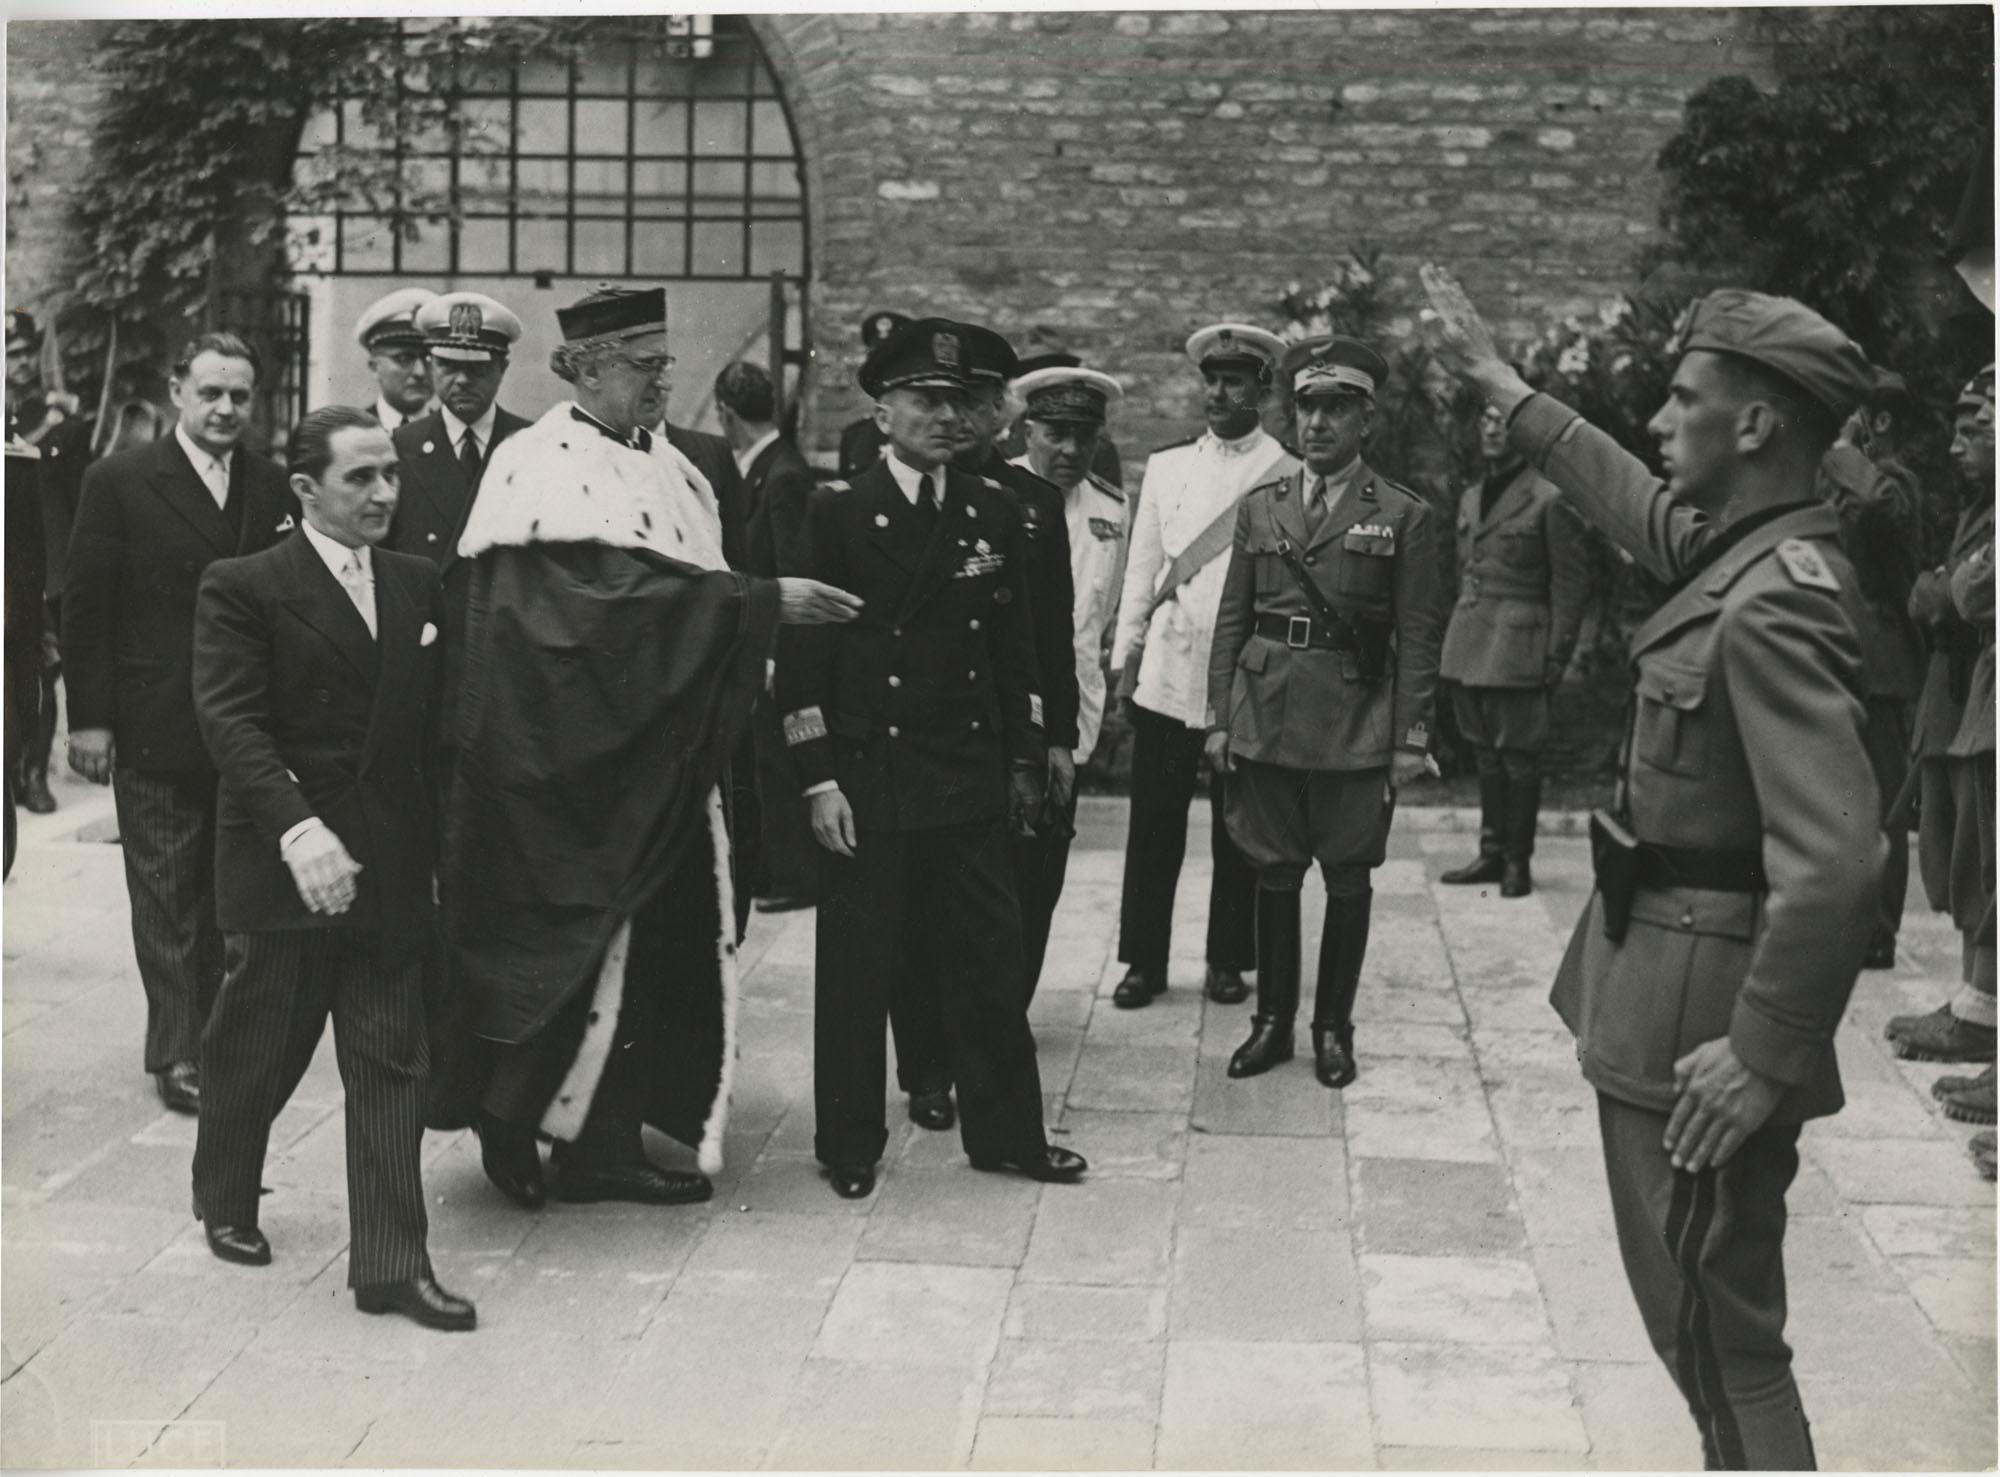 Mihai Antonescu's visit to Benito Mussolini, Photograph 19